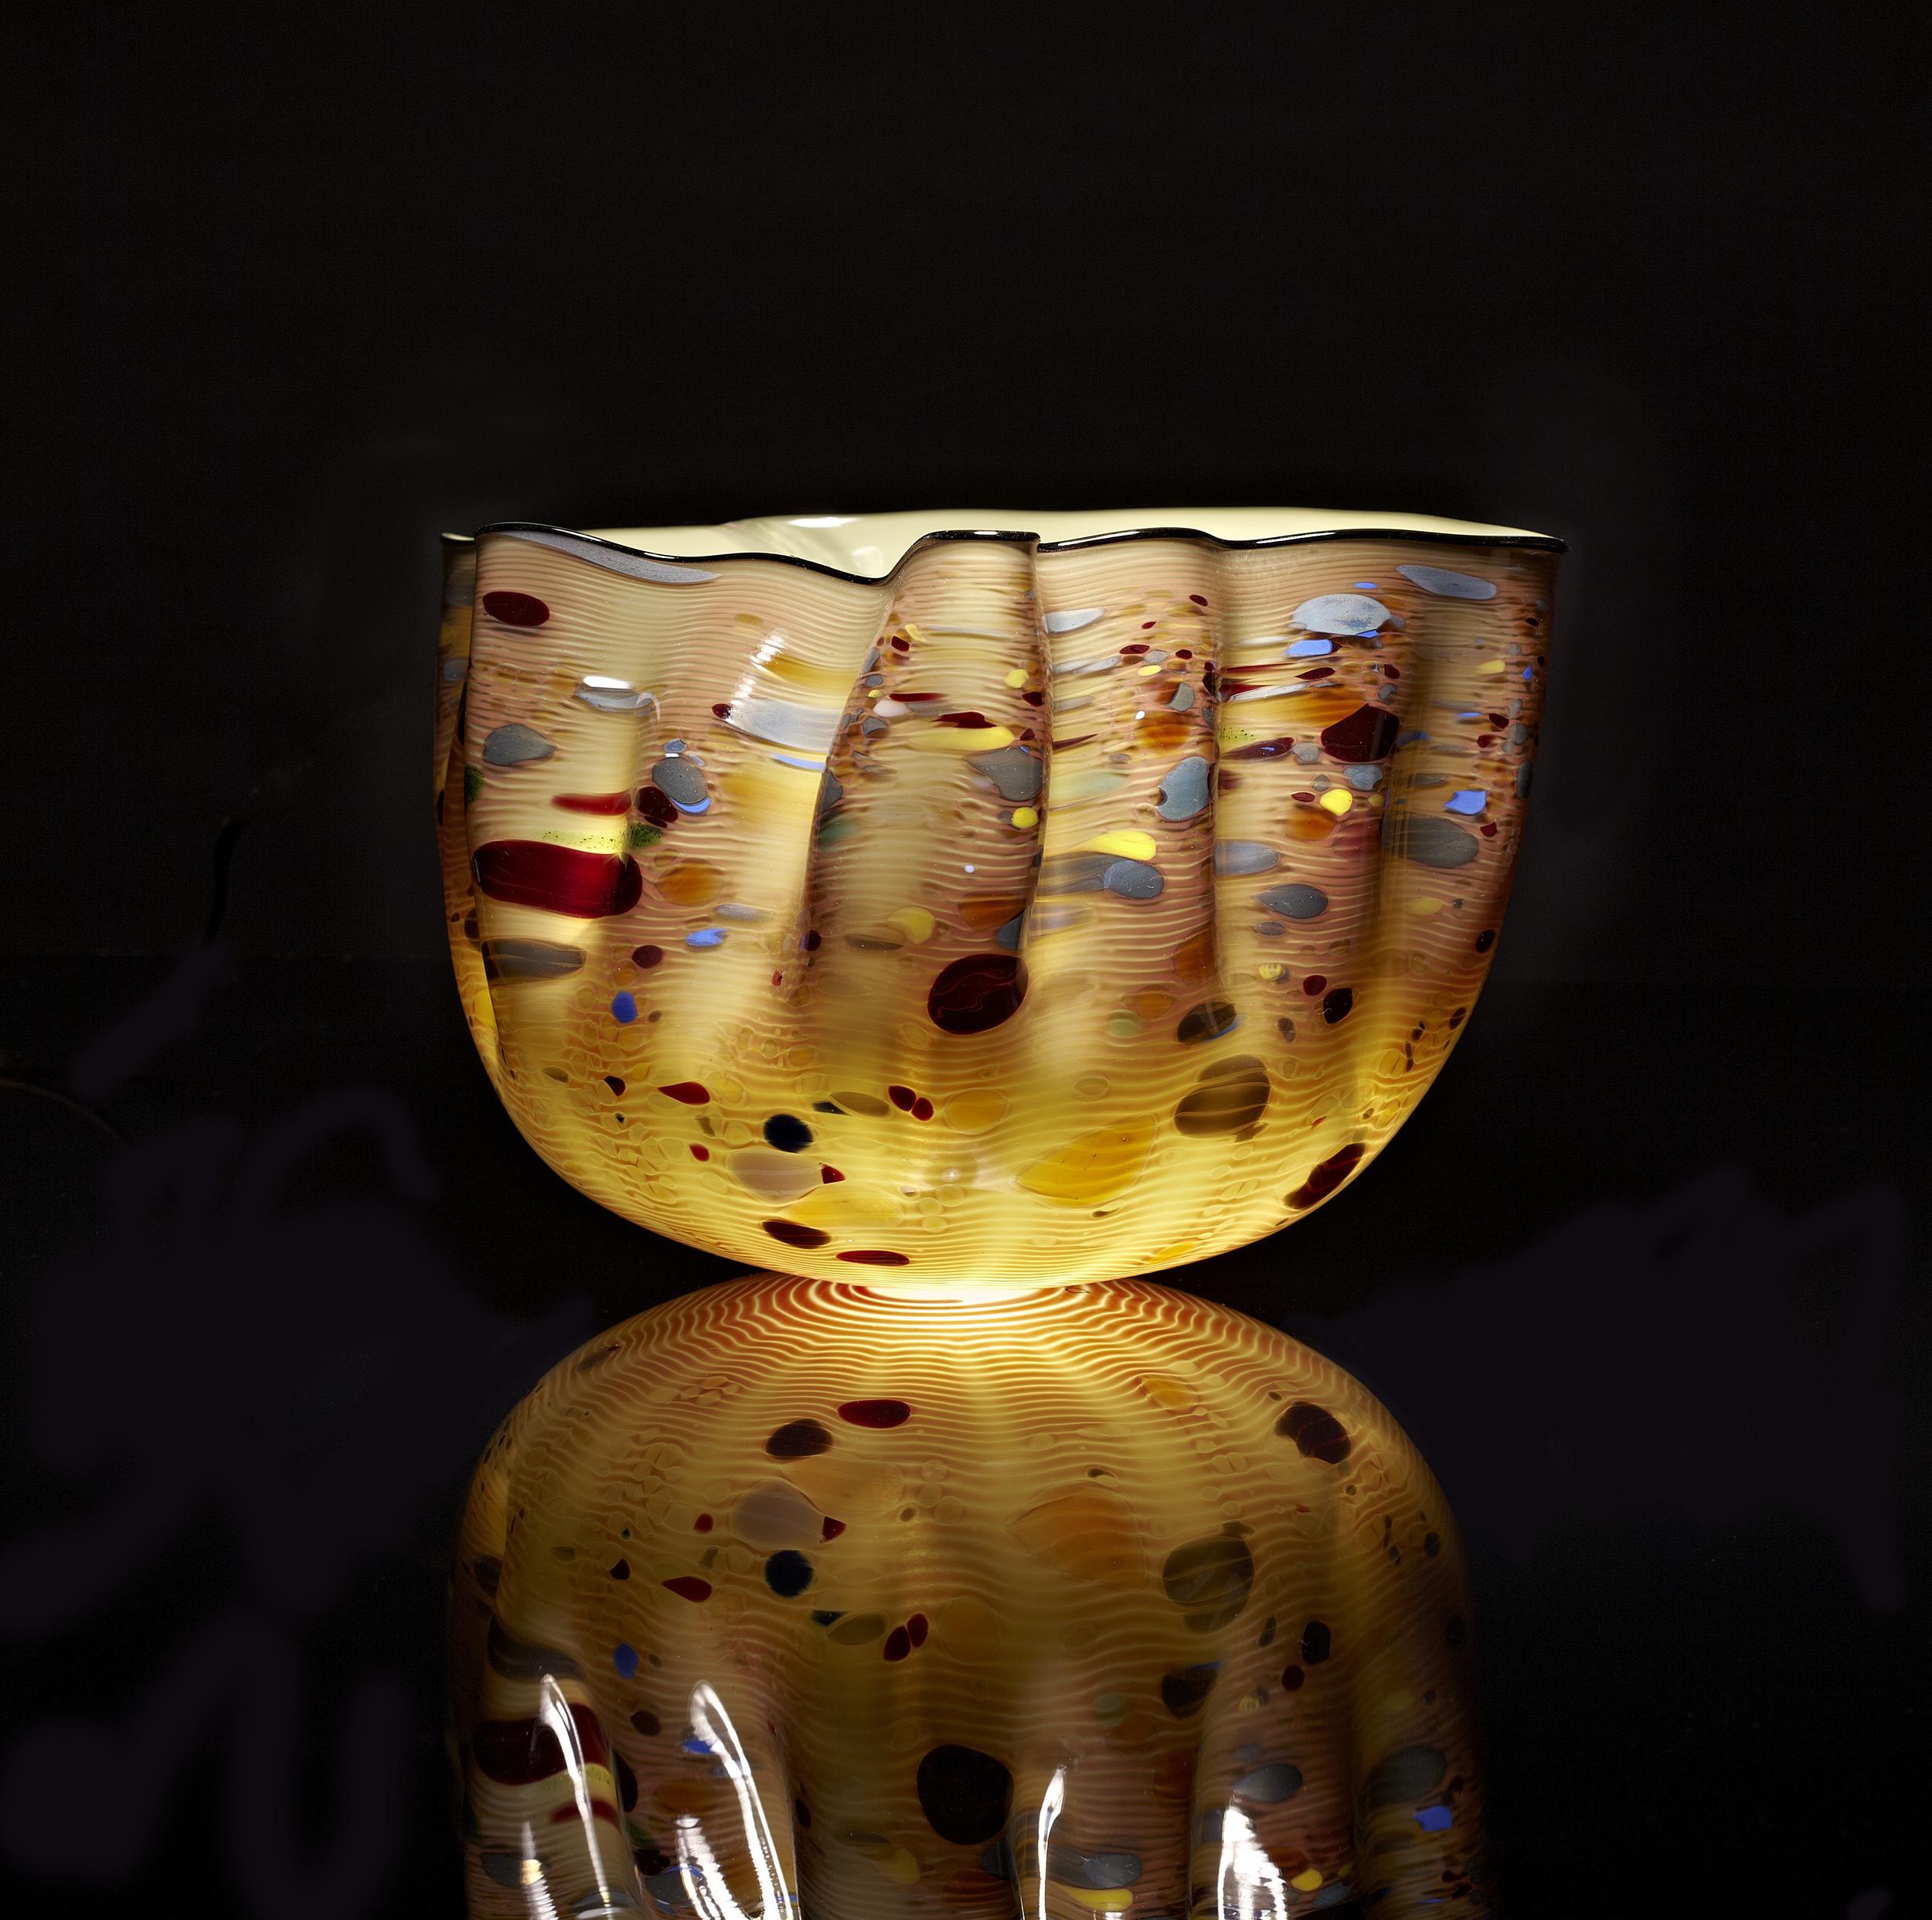 Dale Chihuly, Dark Olive Macchia Set with Black Lip Wrap (1983, glass, 12 x 10 x 8 inches), DC.141.1